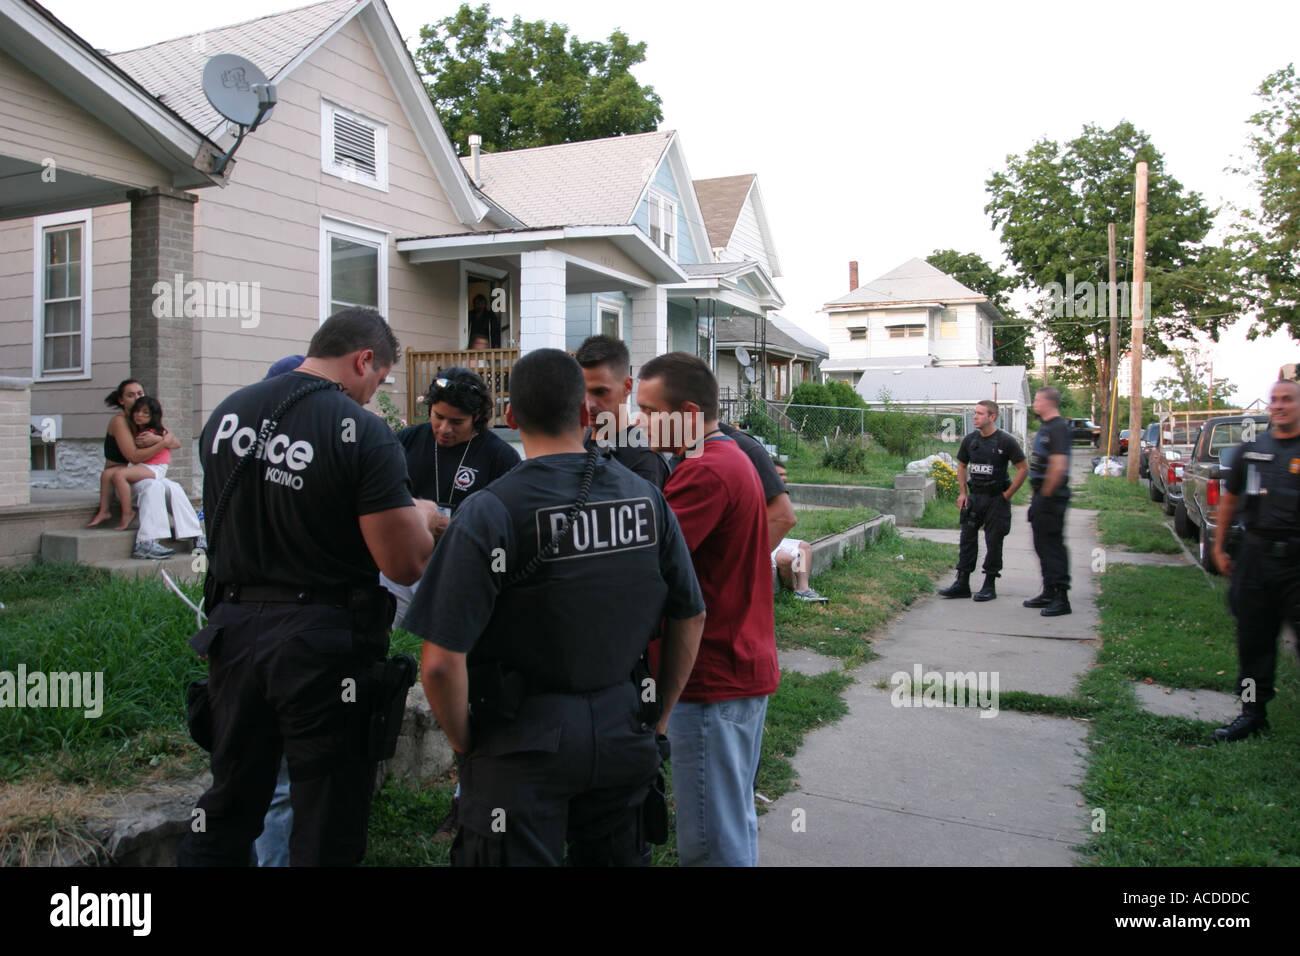 Narcs Arrest Stock Photos & Narcs Arrest Stock Images - Alamy